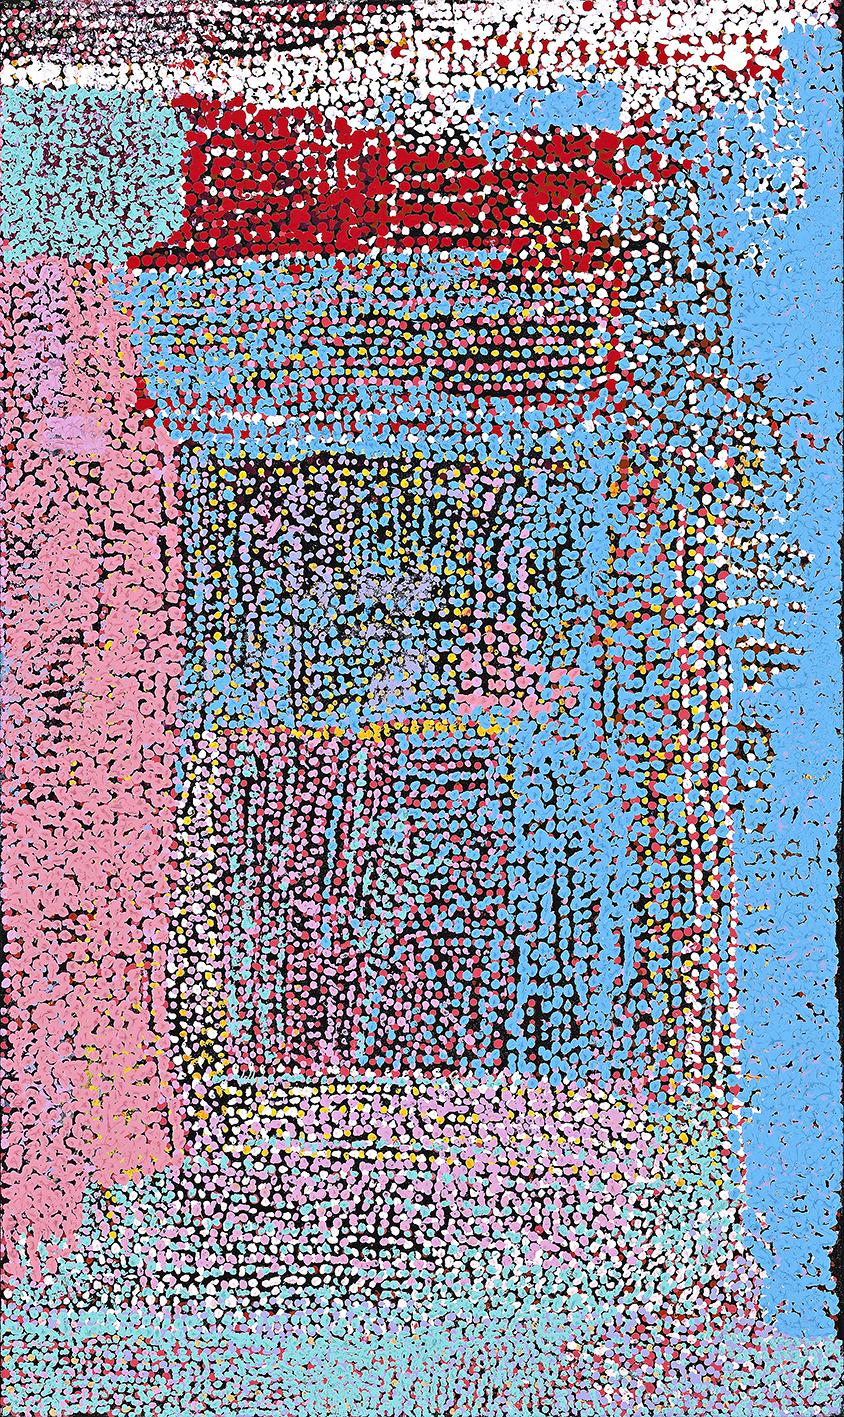 TOMMY MITCHELL , 1943-2013,  Wakalpuka , 2012, 102 x 51 cm